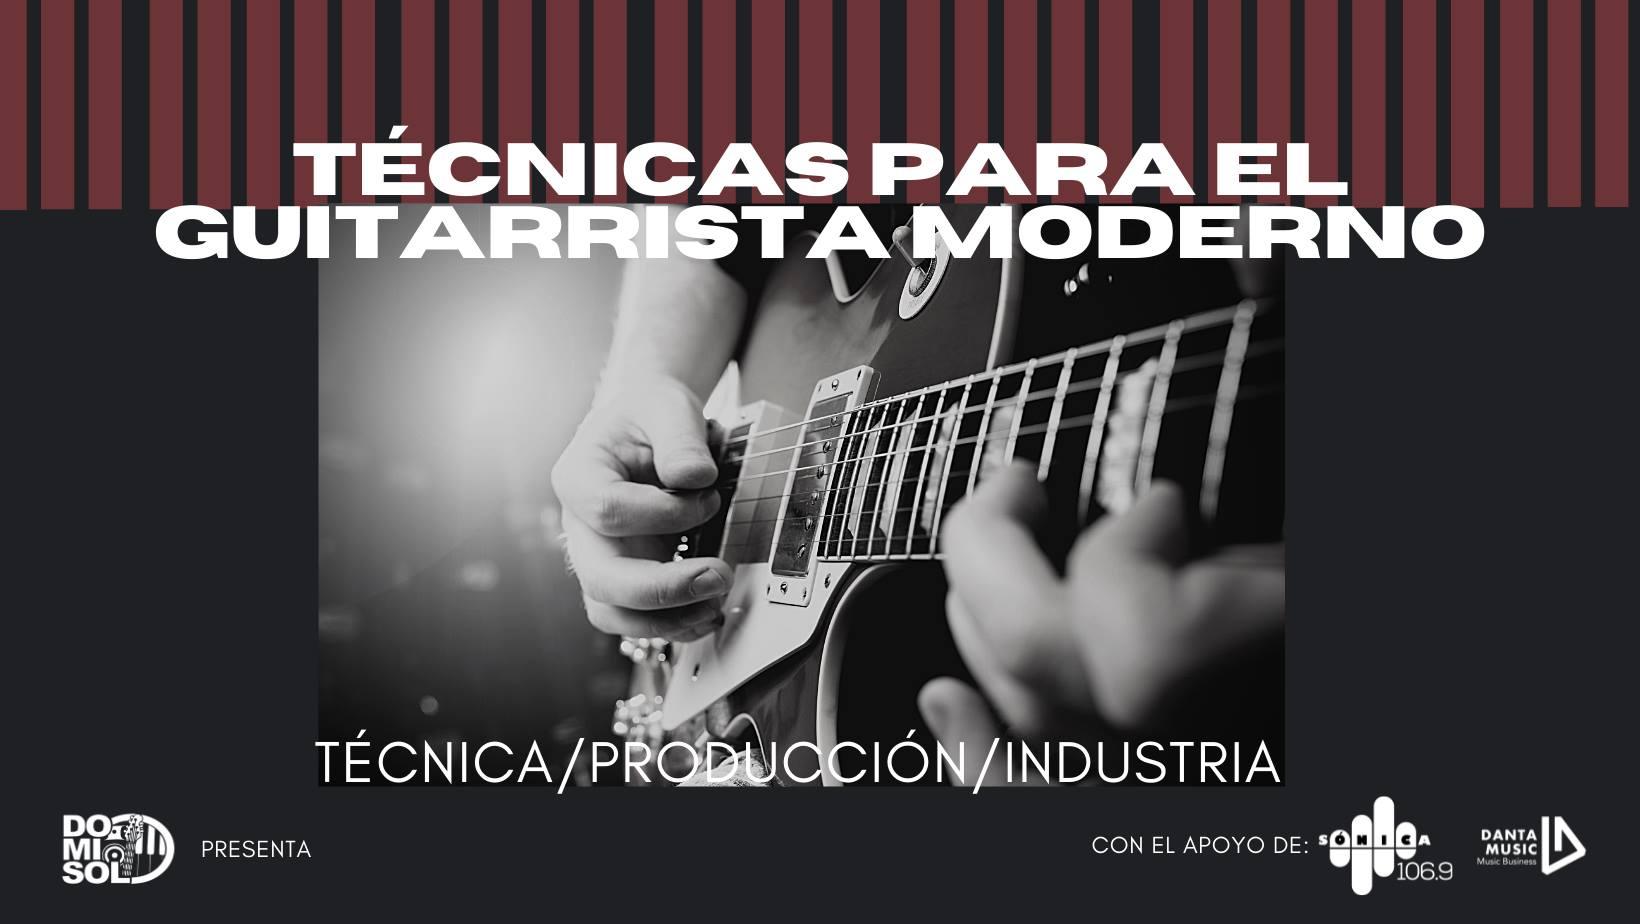 Masterclass: Técnicas para el Guitarrista Moderno